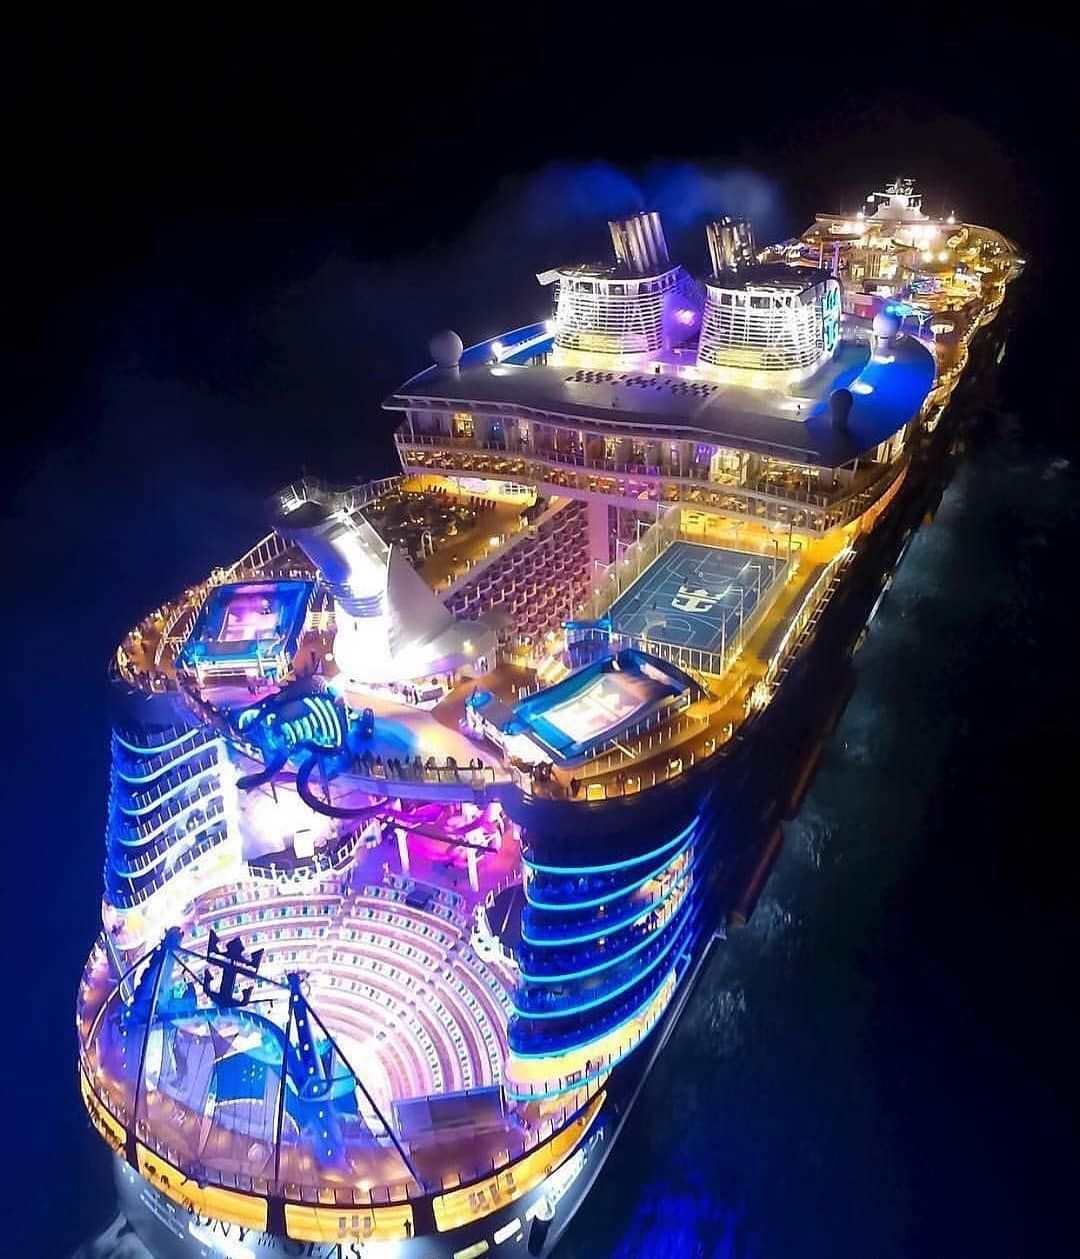 Votre Vie De Luxe Commence Ici Https Bit Ly 2m2xal0 Kingdomofbillionaires Luxe Argent Riche Ri Cruise Ship Pictures Biggest Cruise Ship Cruise Party